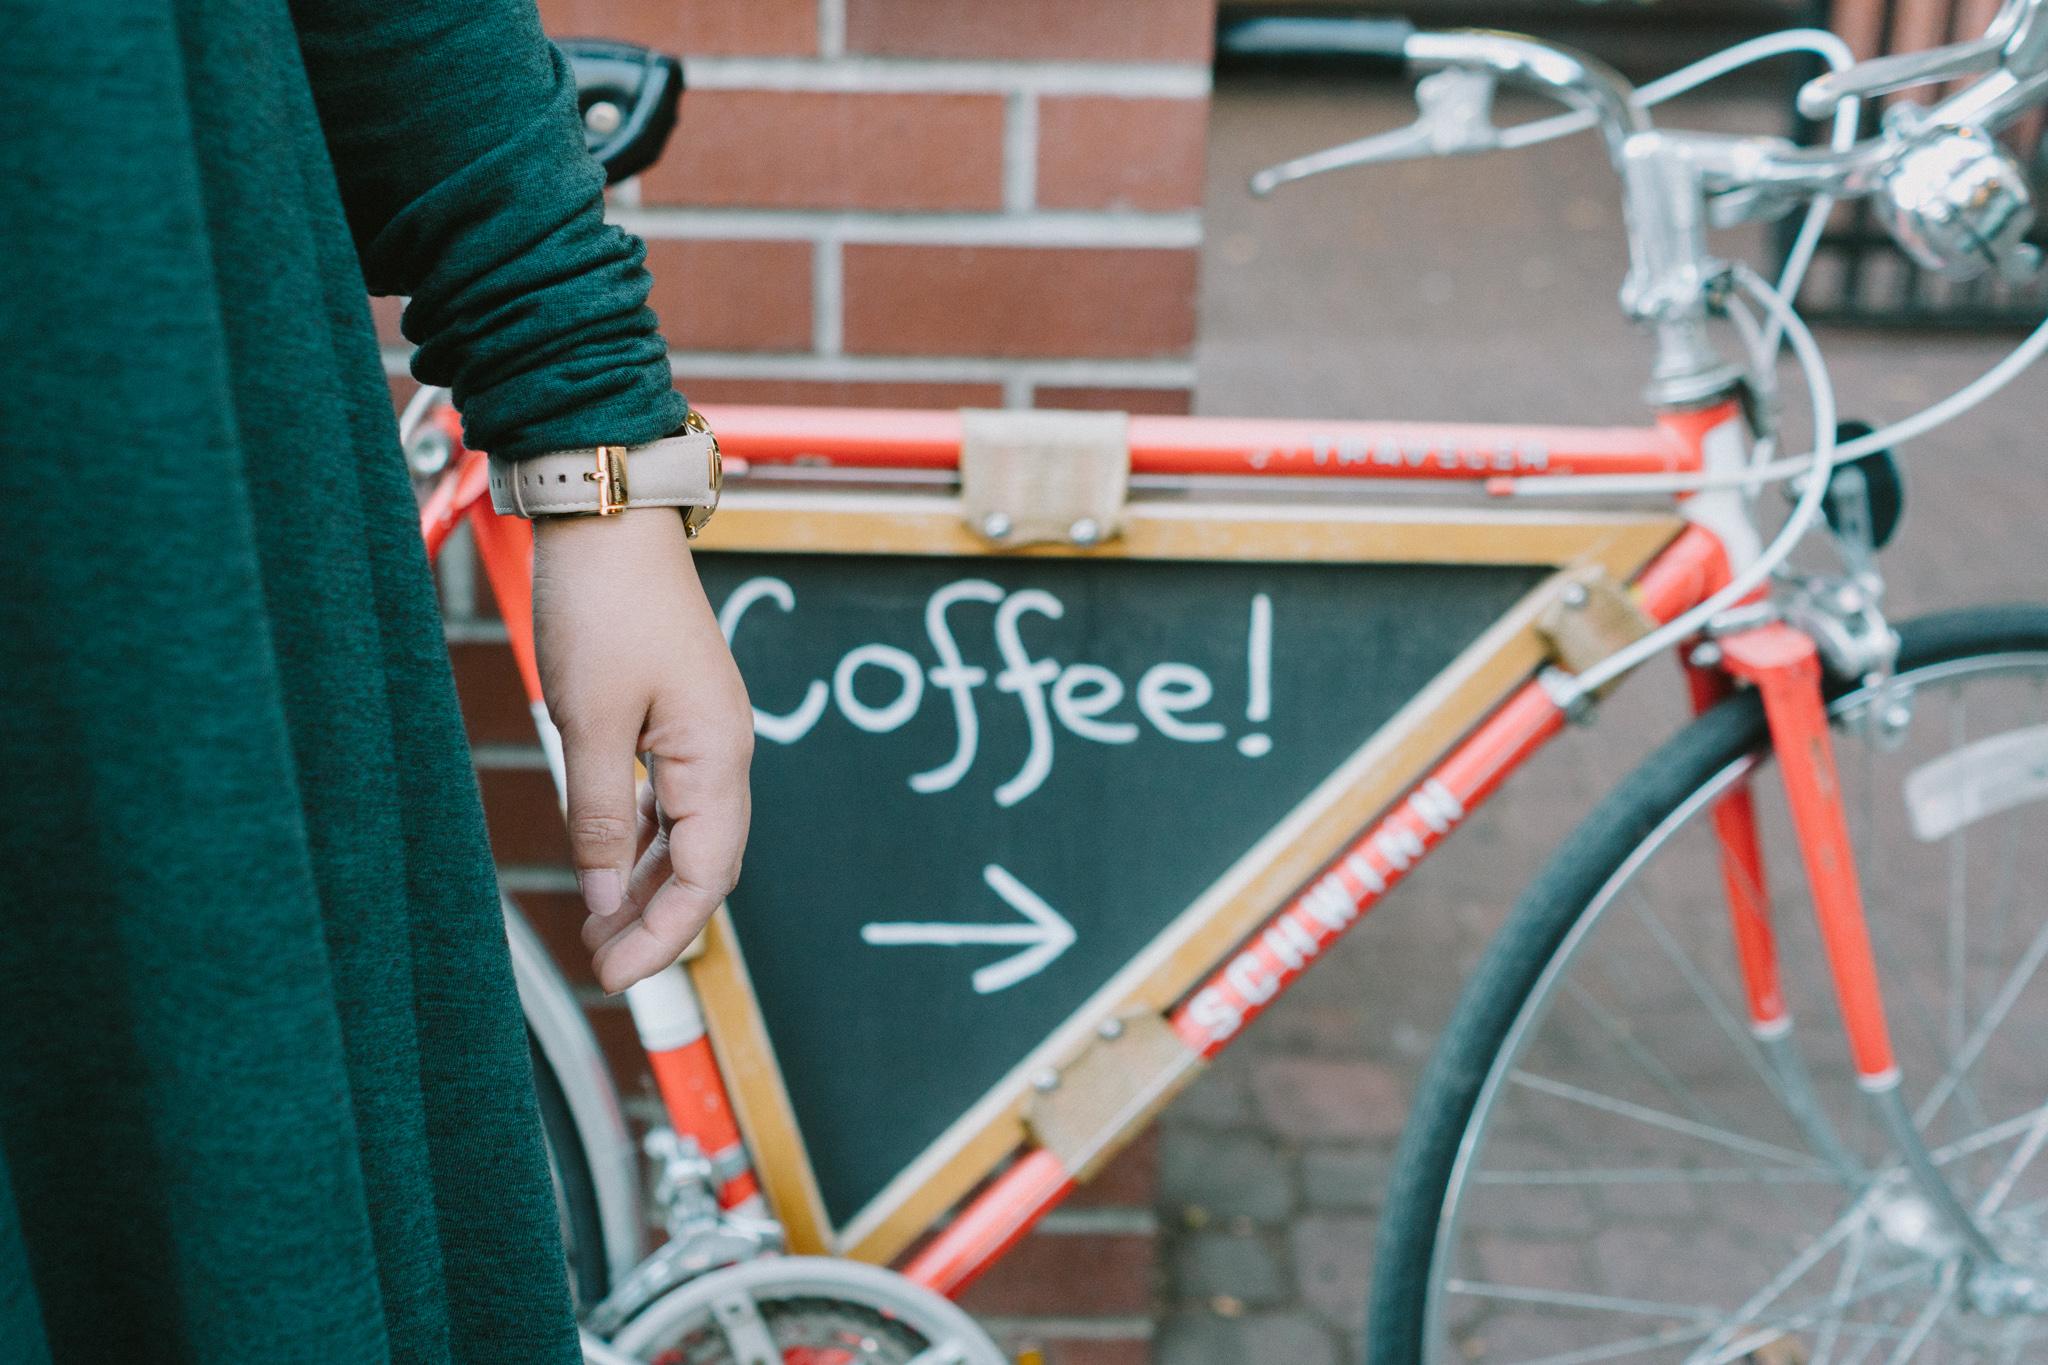 Coffee Sign on a Bike